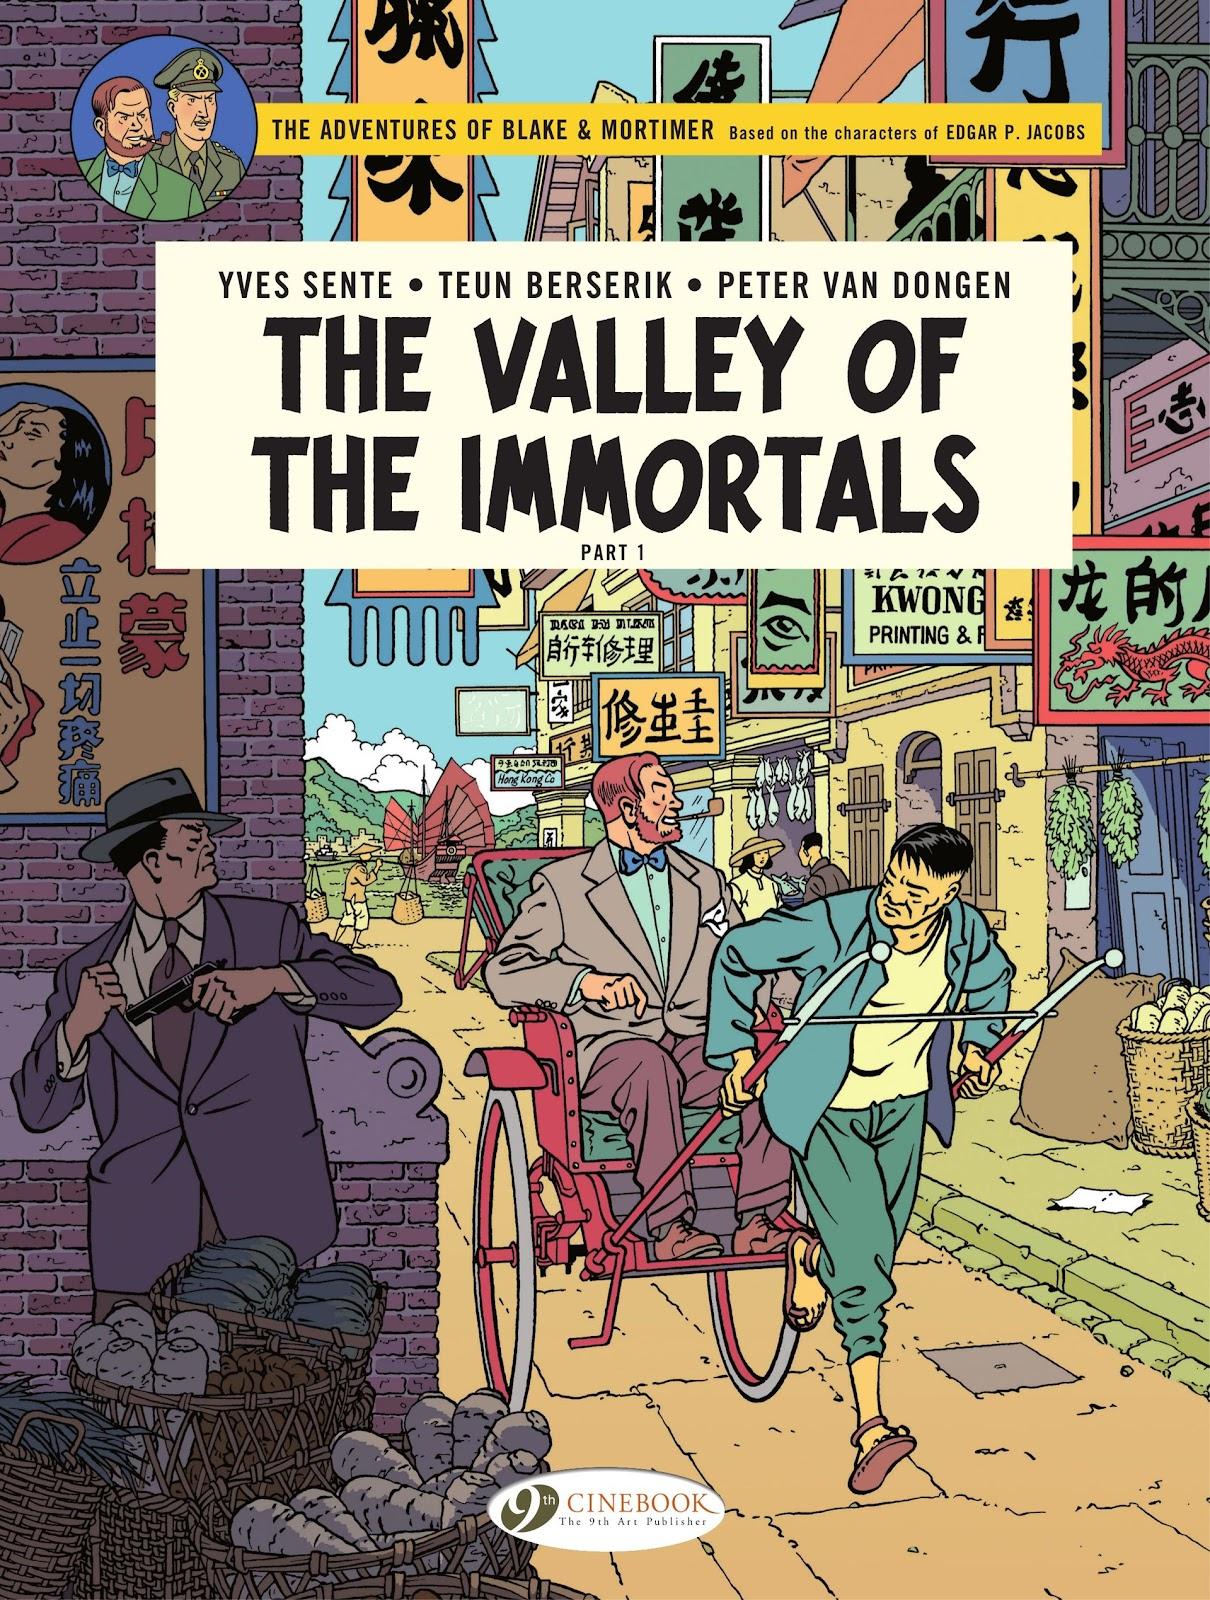 Read online Blake & Mortimer comic -  Issue #25 - 1